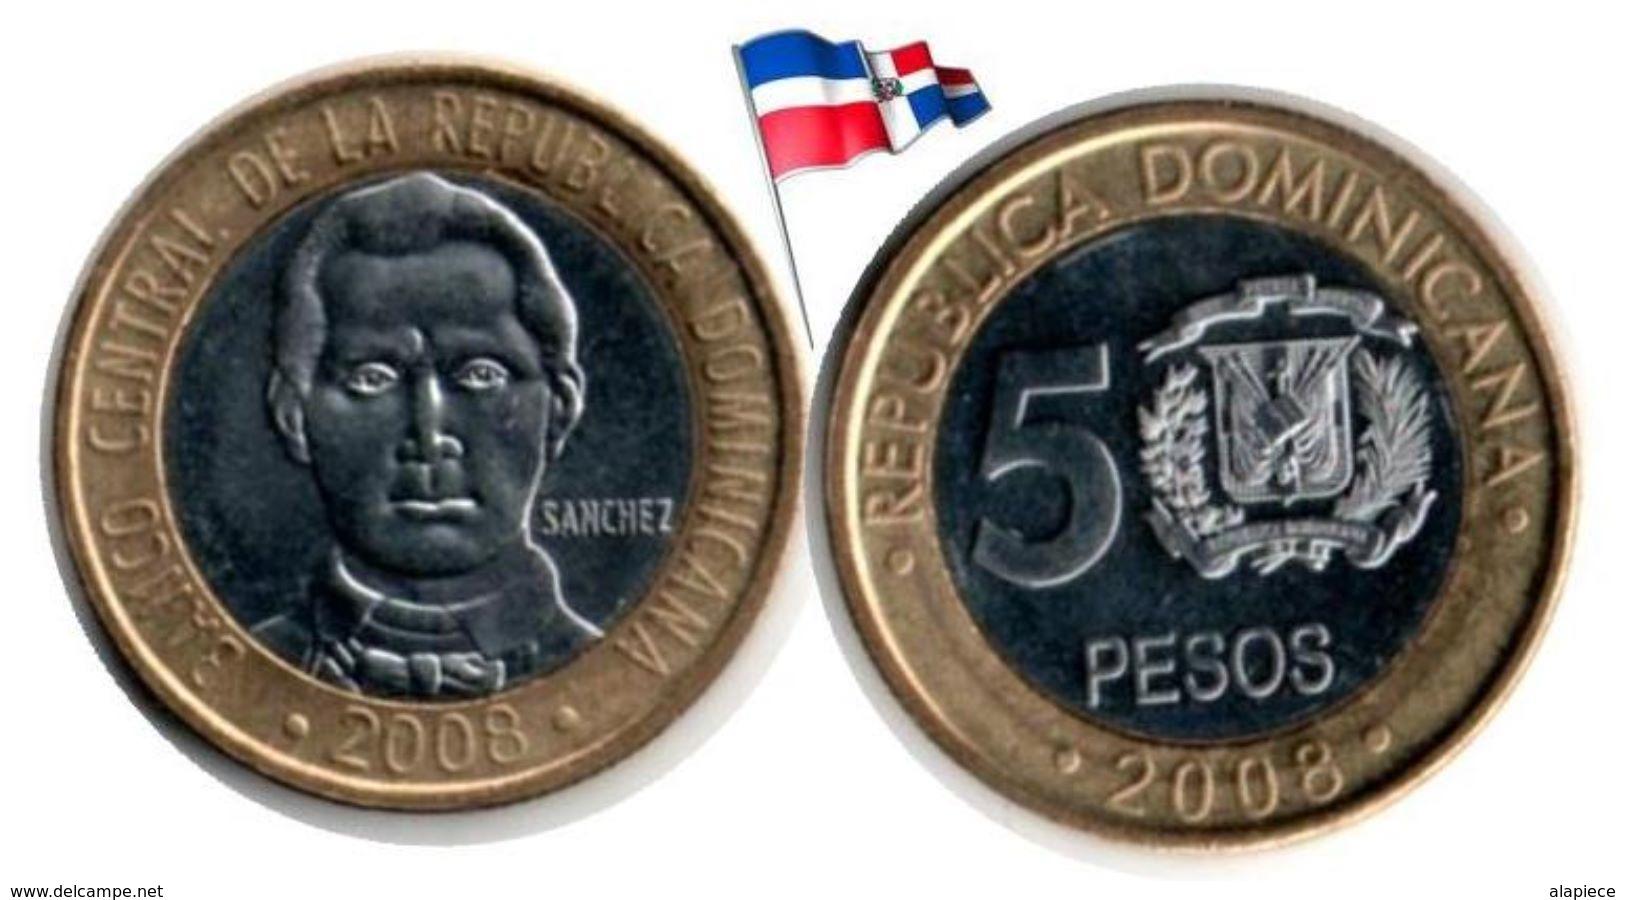 Dominican Republic - 5 Pesos 2008 (UNC) - Dominicana